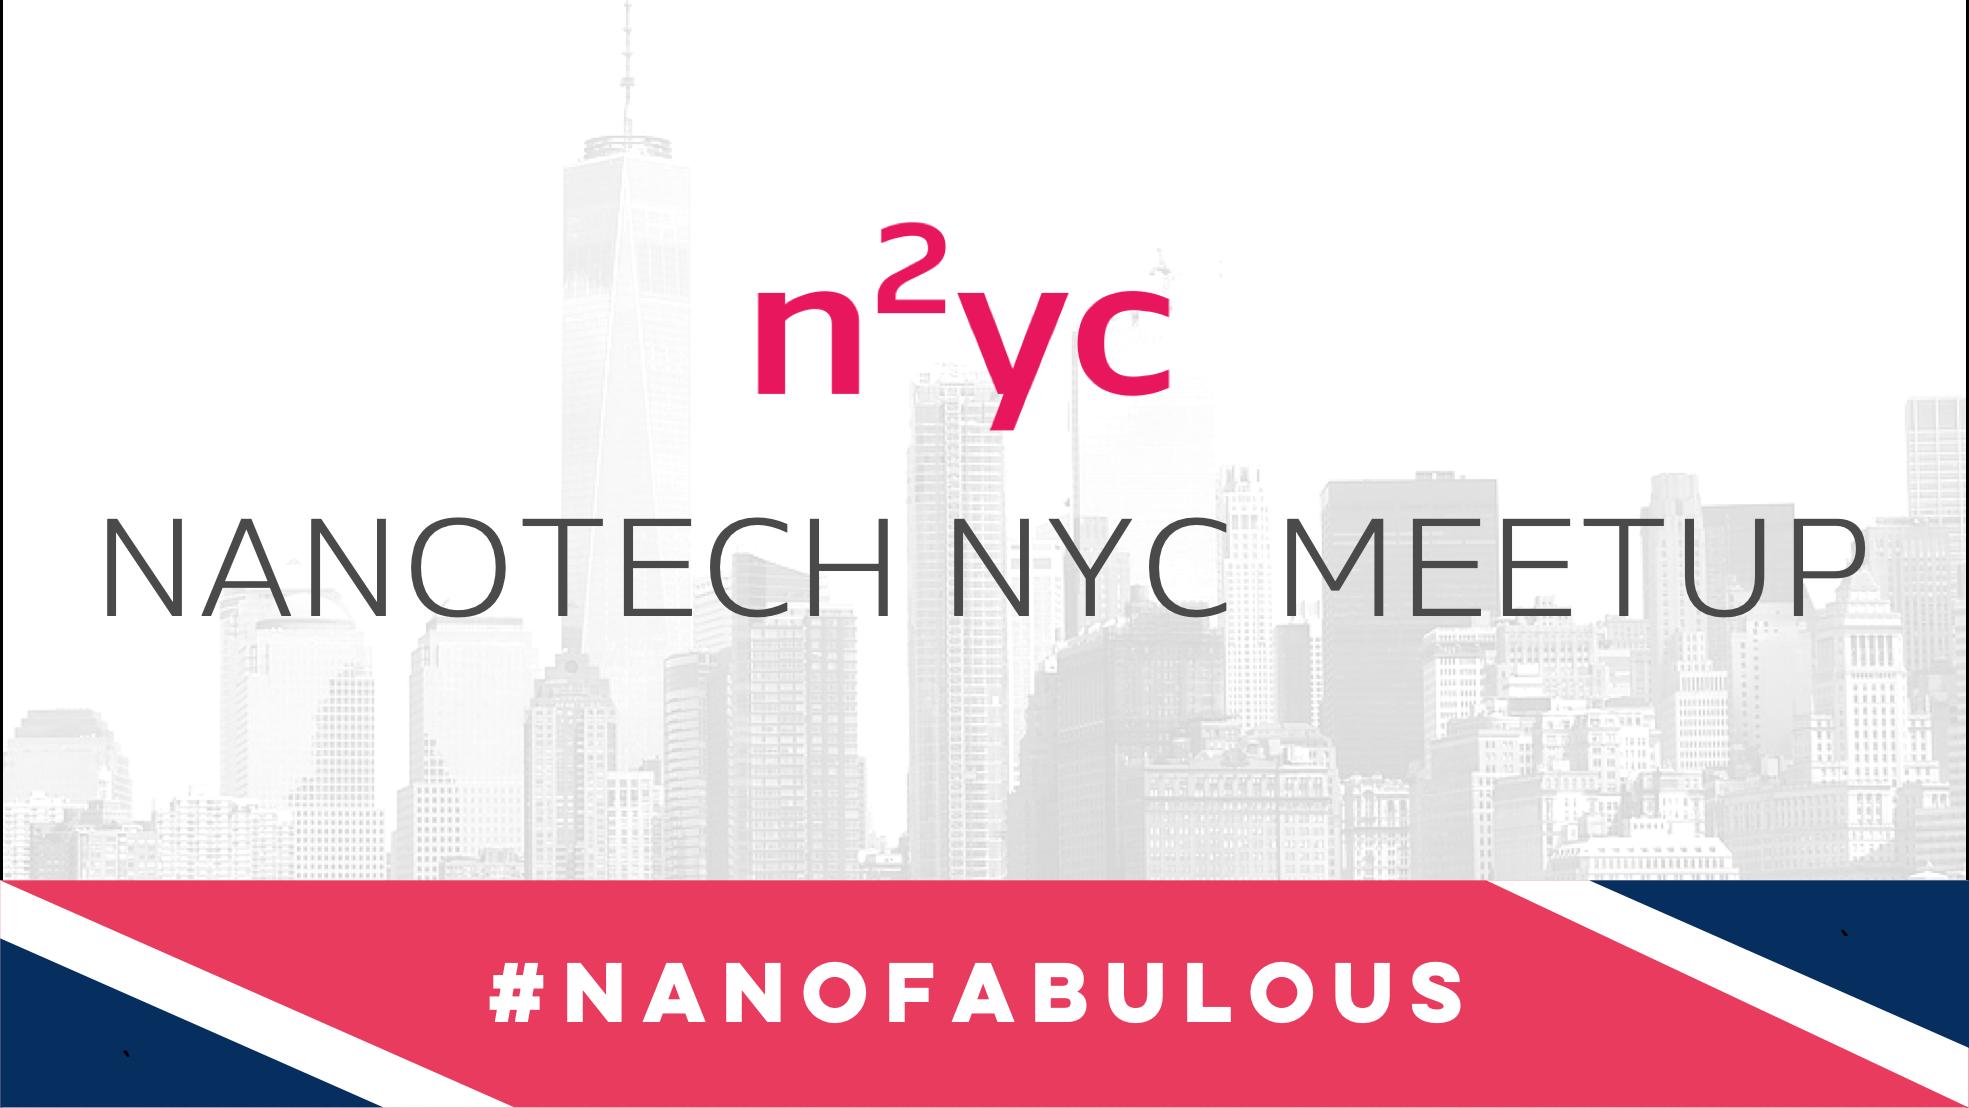 Nanotech NYC Meetup